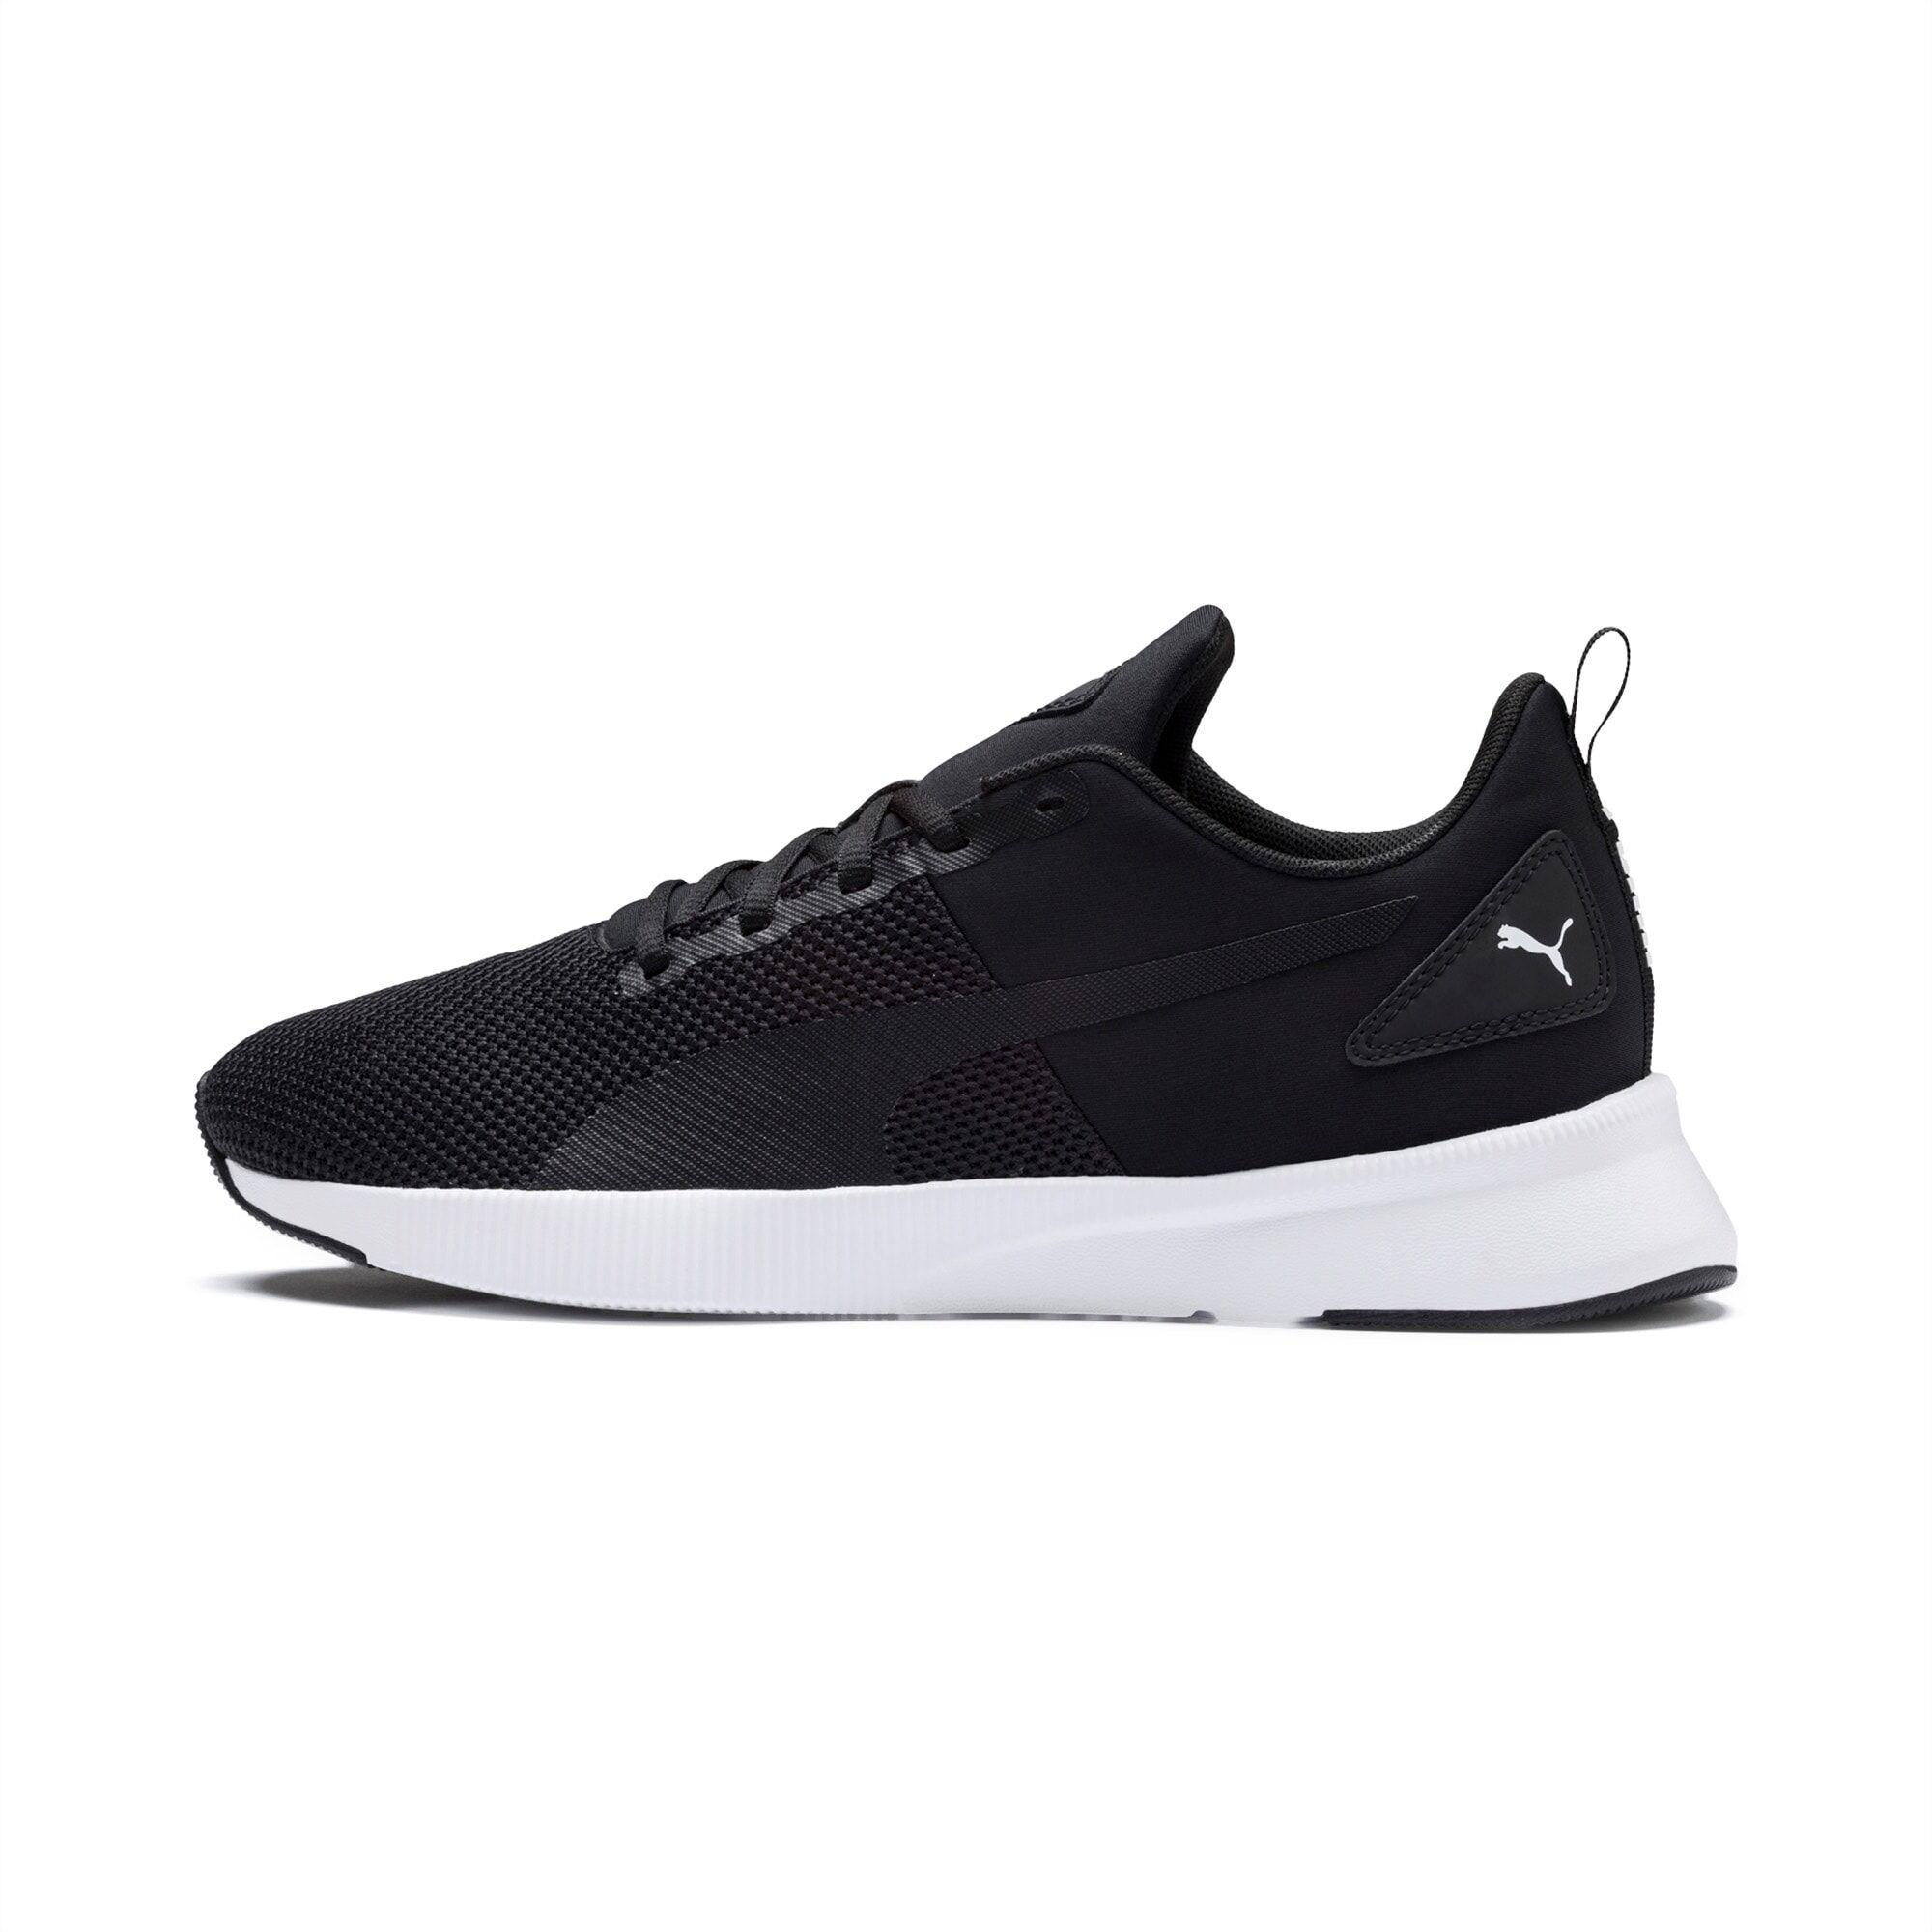 PUMA Chaussure de course Flyer Runner, Noir/Blanc, Taille 38, Chaussures